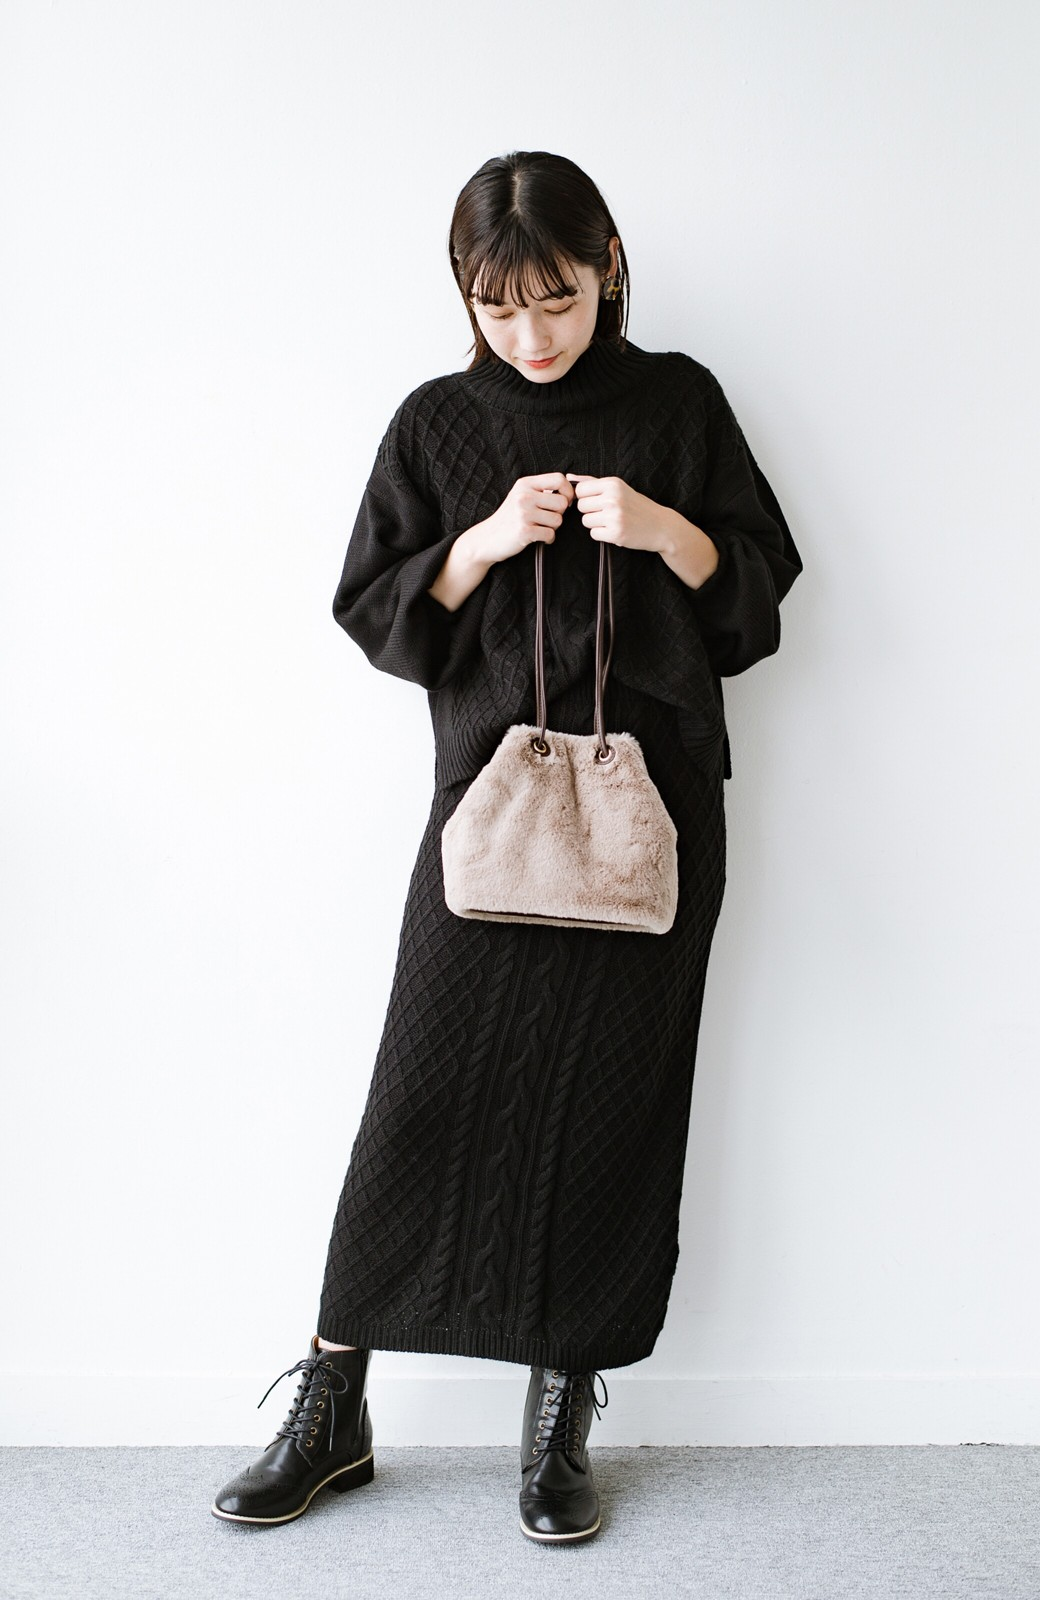 haco! さっと持って気分が上がる ふわっとかわいいエコファー巾着バッグ <グレイッシュベージュ>の商品写真14